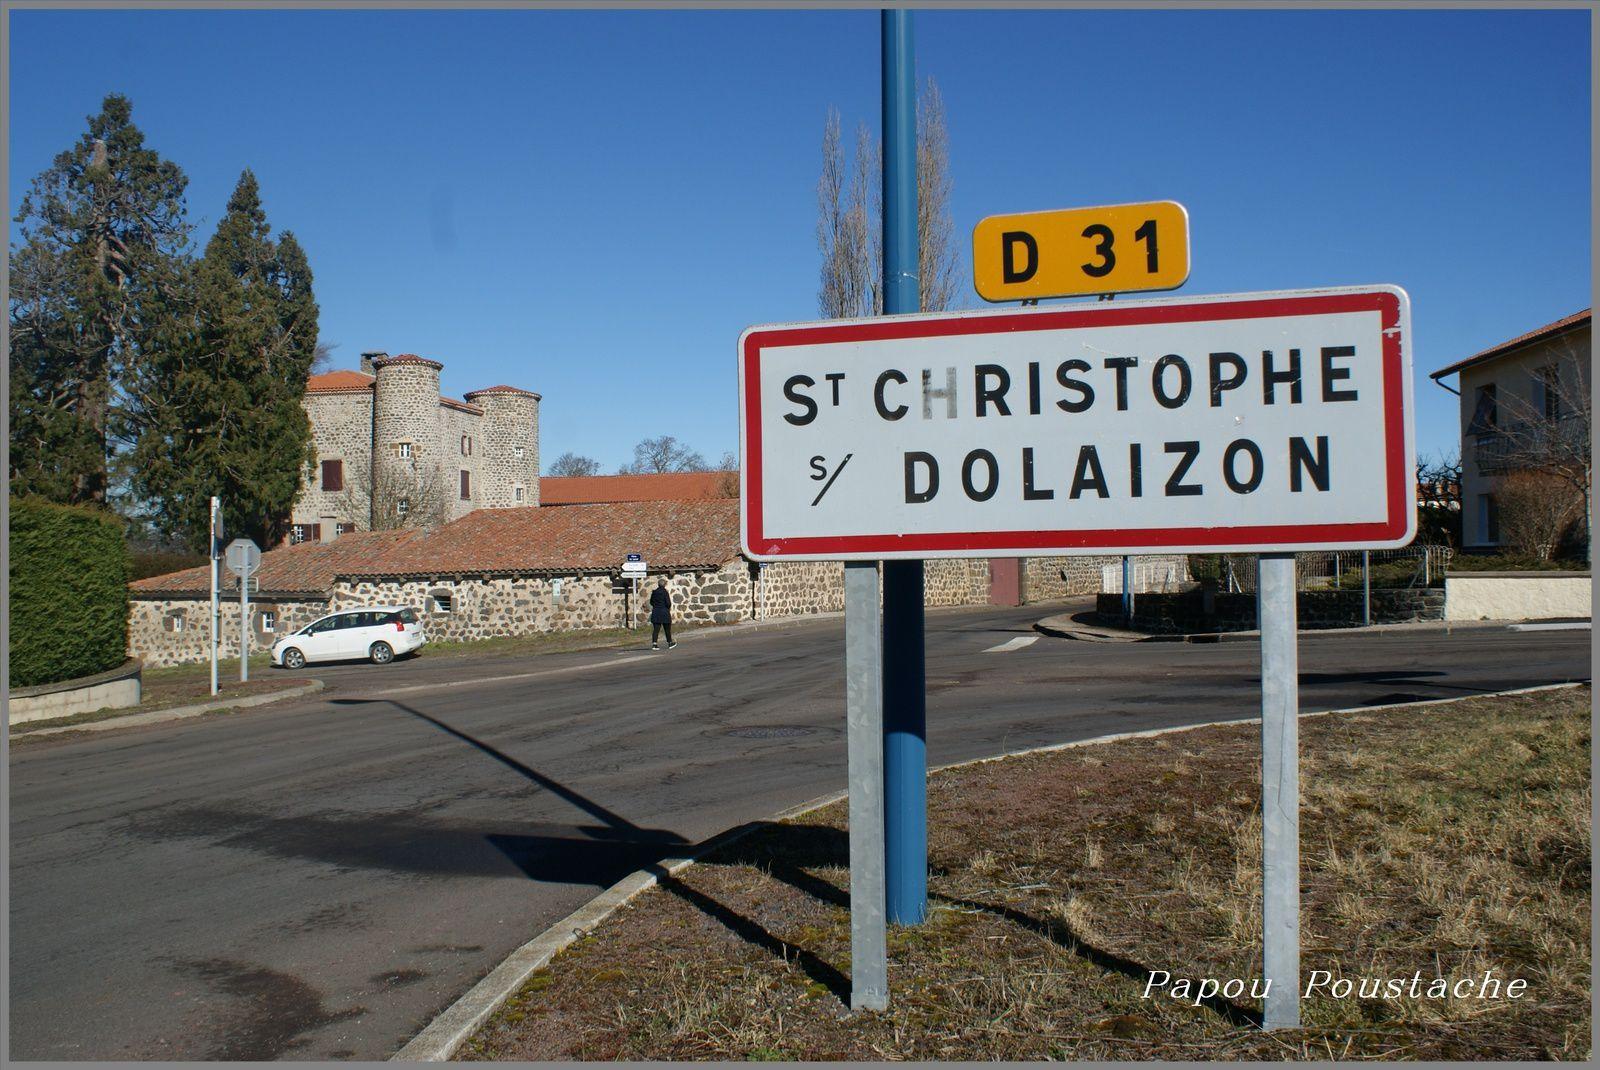 Saint Christophe sur Dolaizon